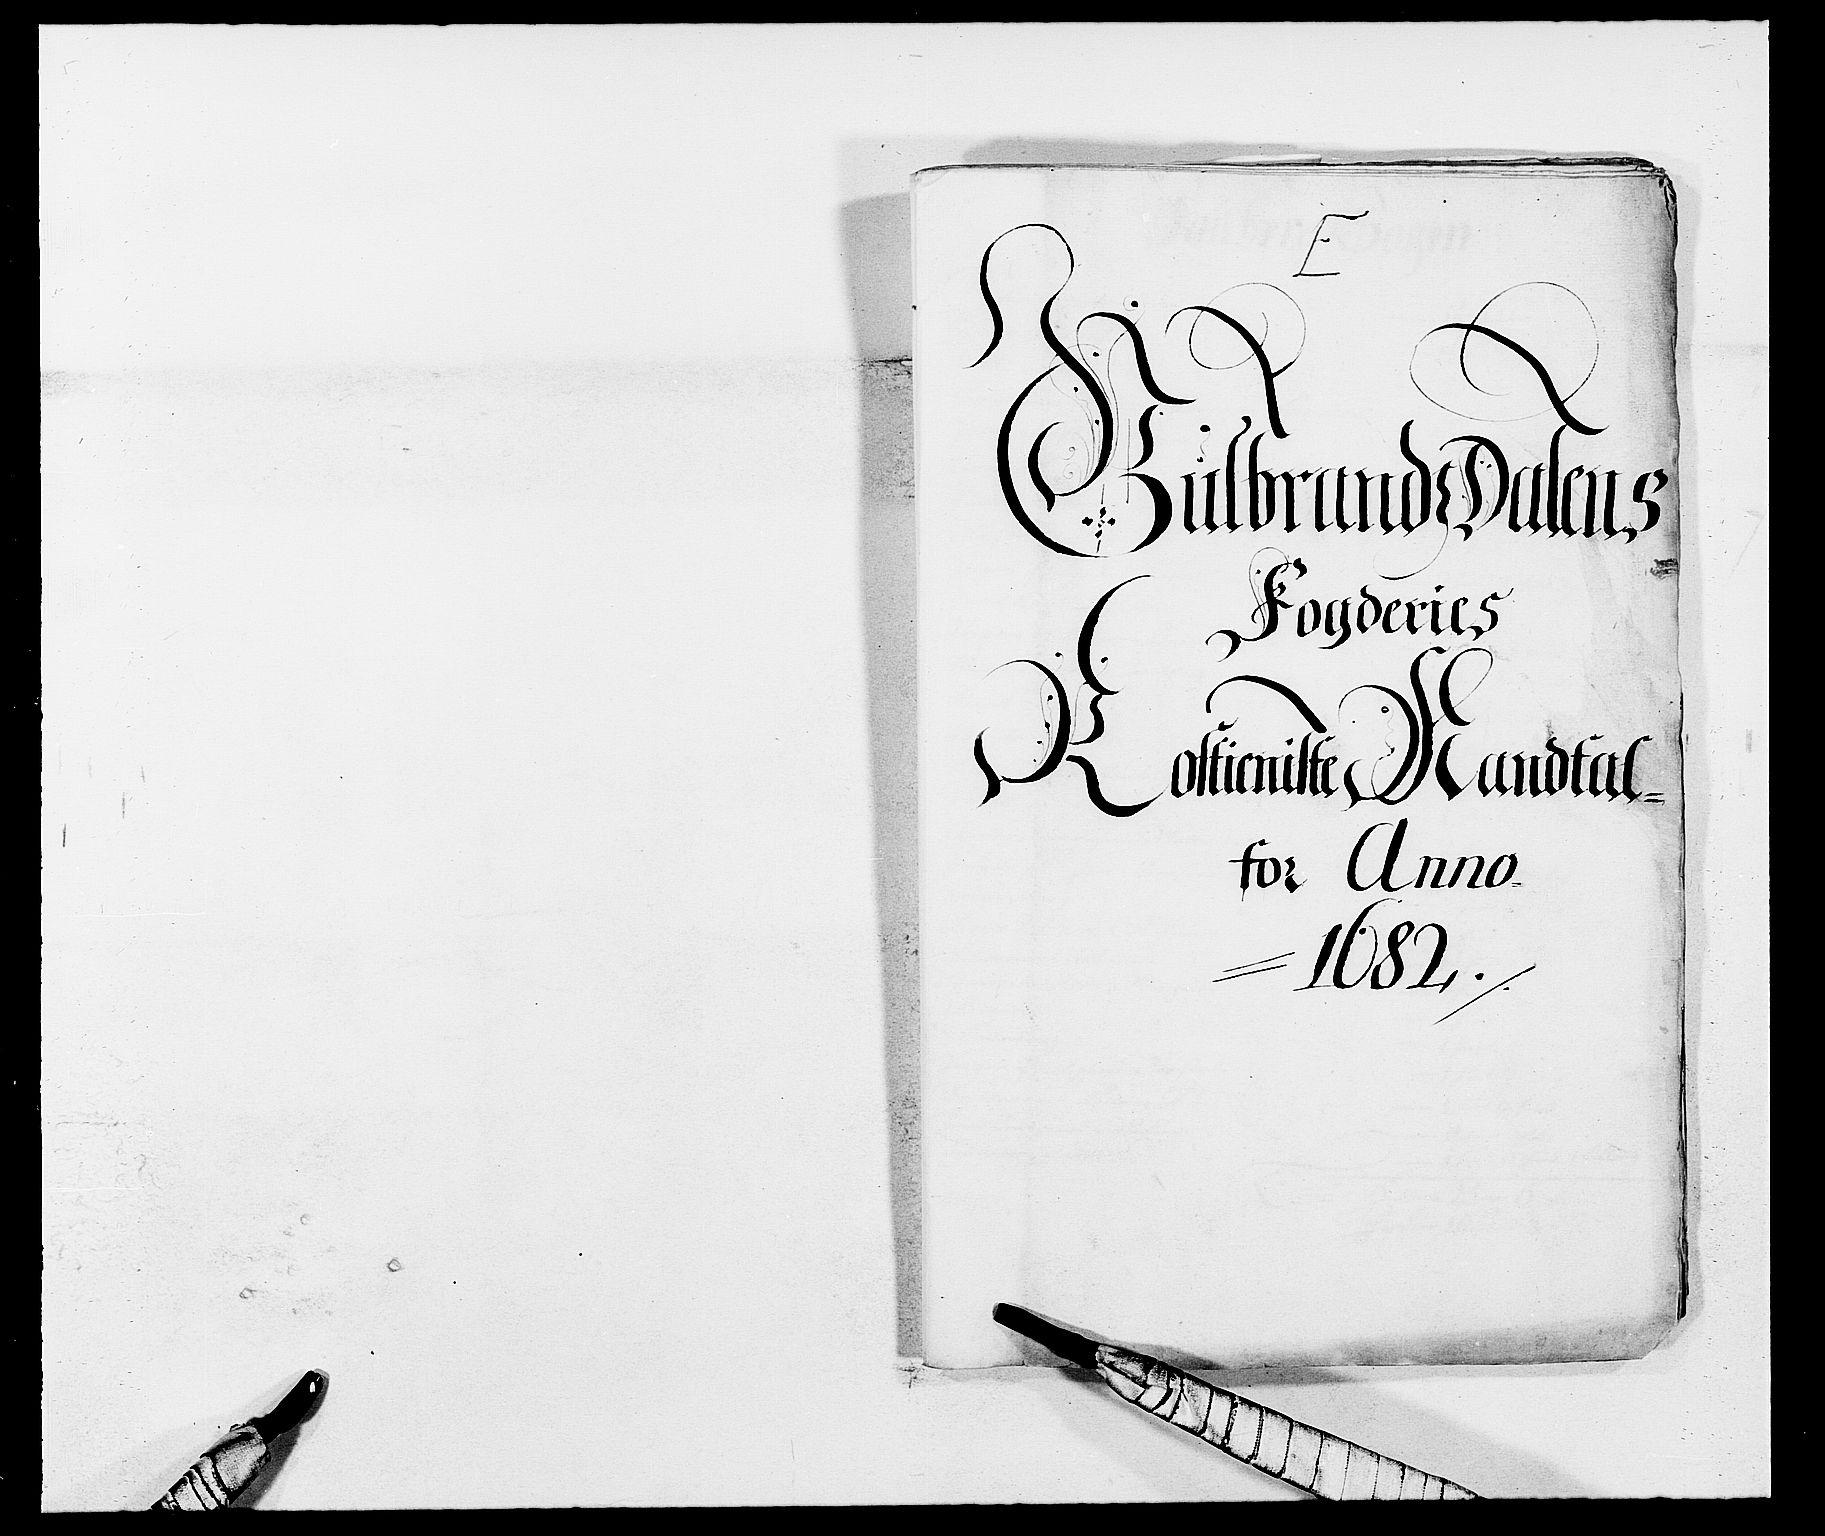 RA, Rentekammeret inntil 1814, Reviderte regnskaper, Fogderegnskap, R17/L1157: Fogderegnskap Gudbrandsdal, 1682-1689, s. 314